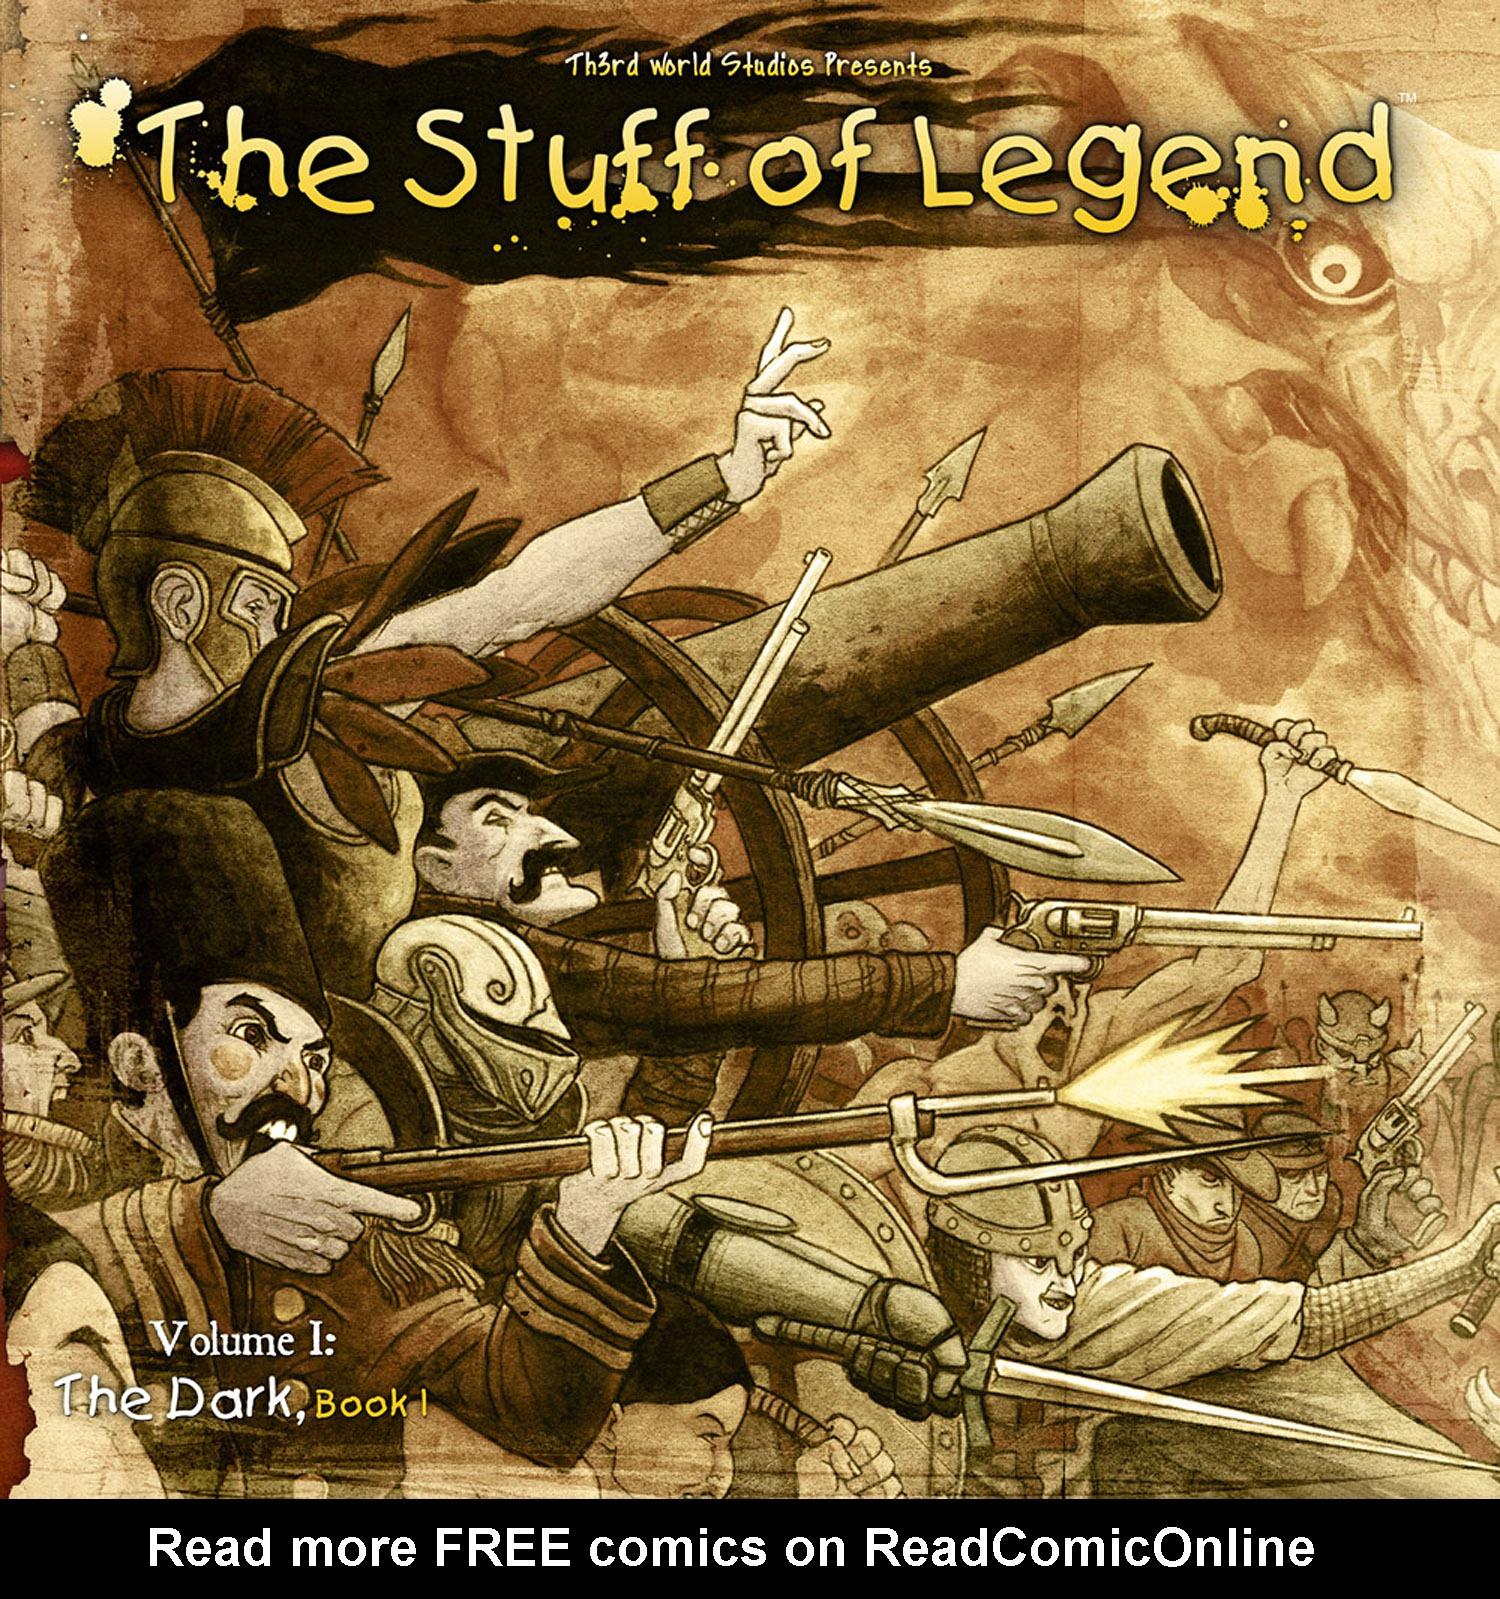 The Stuff of Legend: Volume I: The Dark 4 Page 1